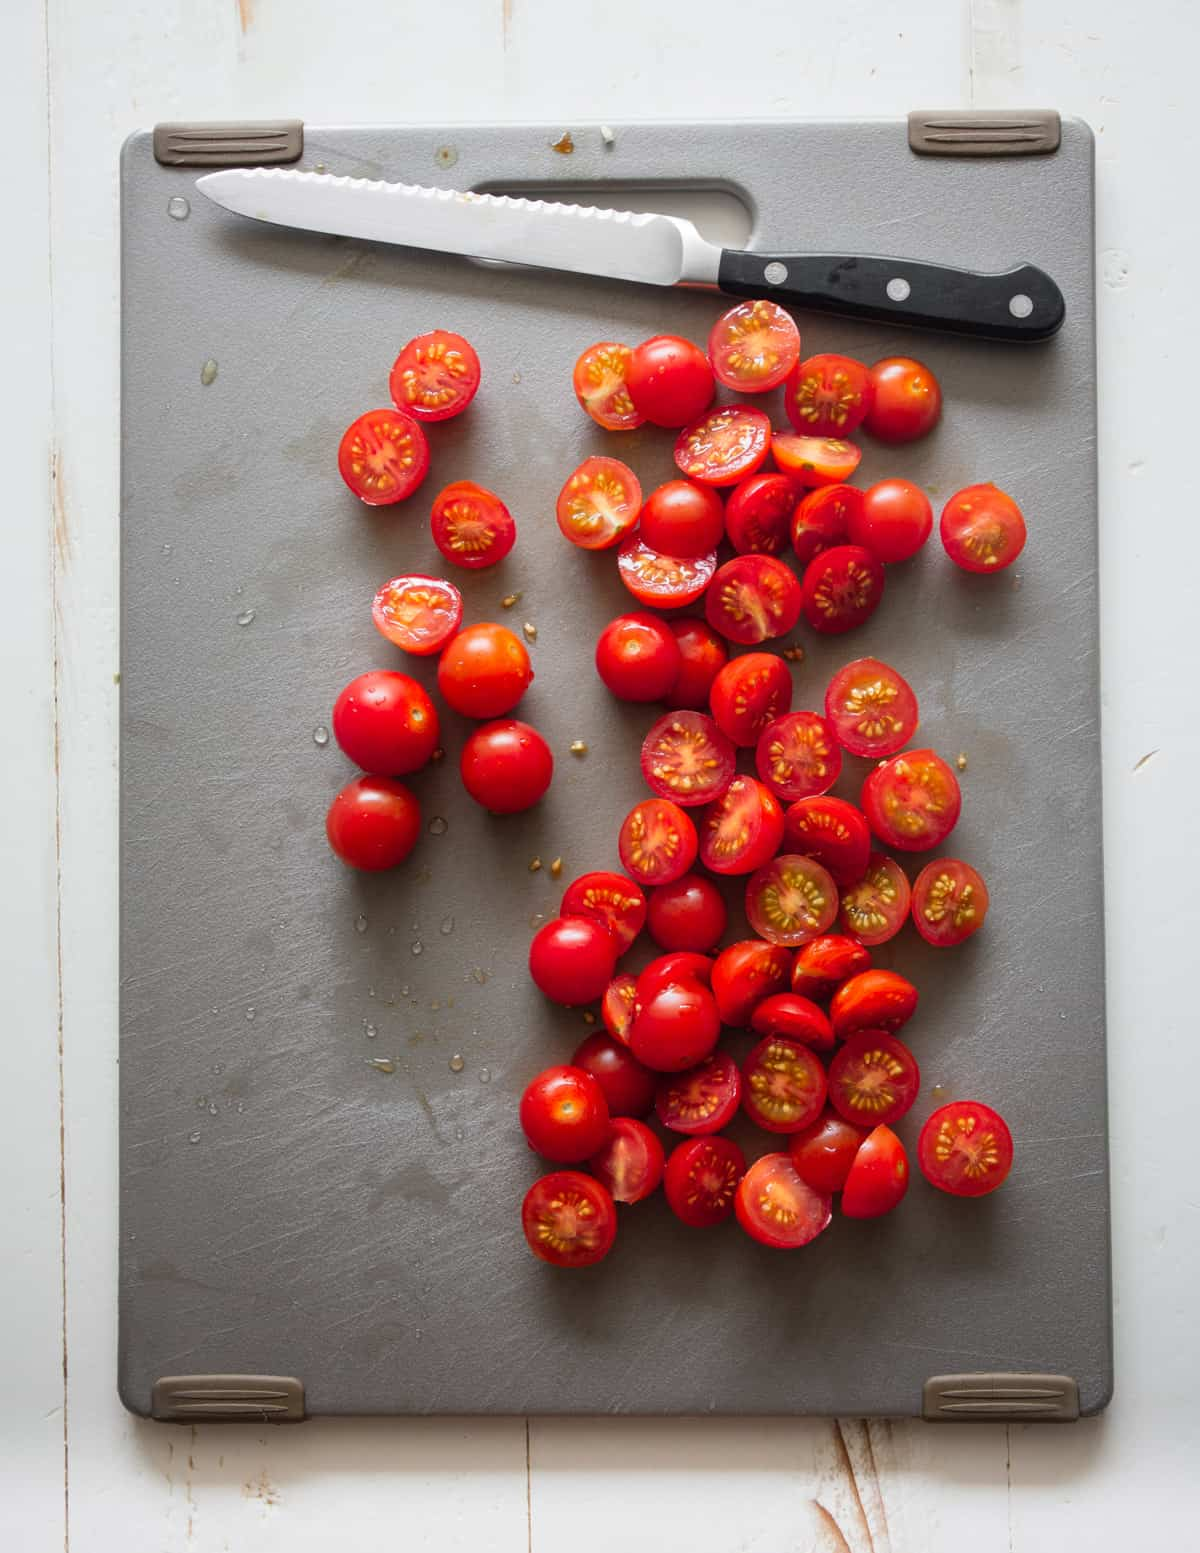 cutting tomatoes on a grey cutting board